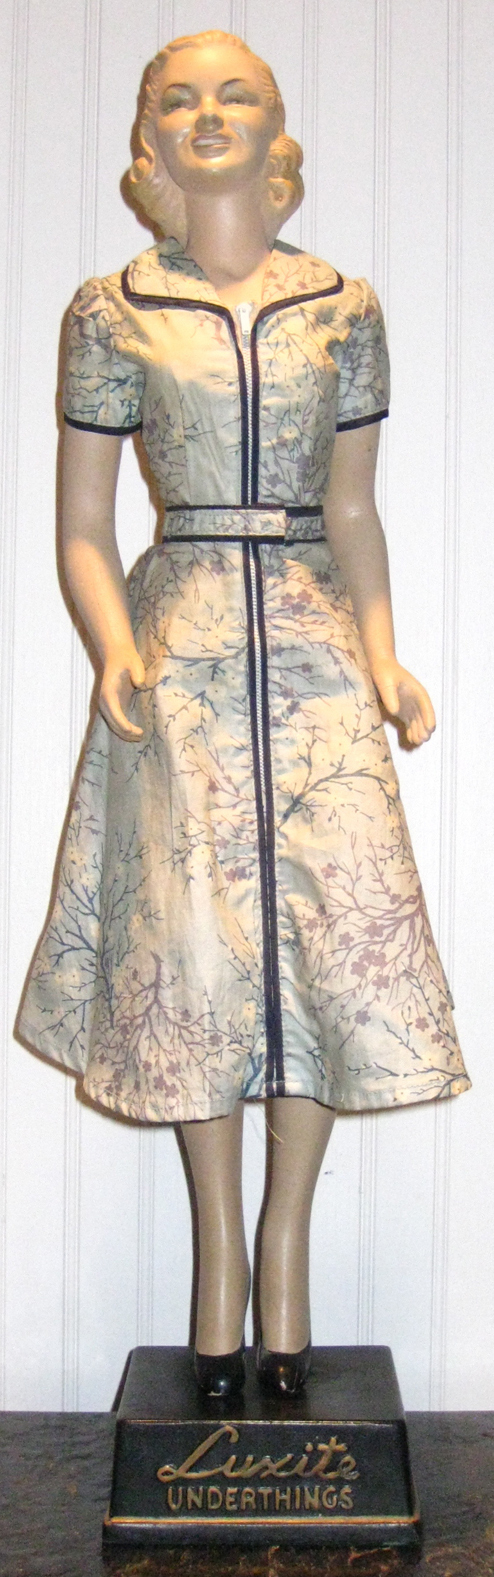 1940 39 s luxite princess peggy mini mannequin advertising figure store display mannequins. Black Bedroom Furniture Sets. Home Design Ideas